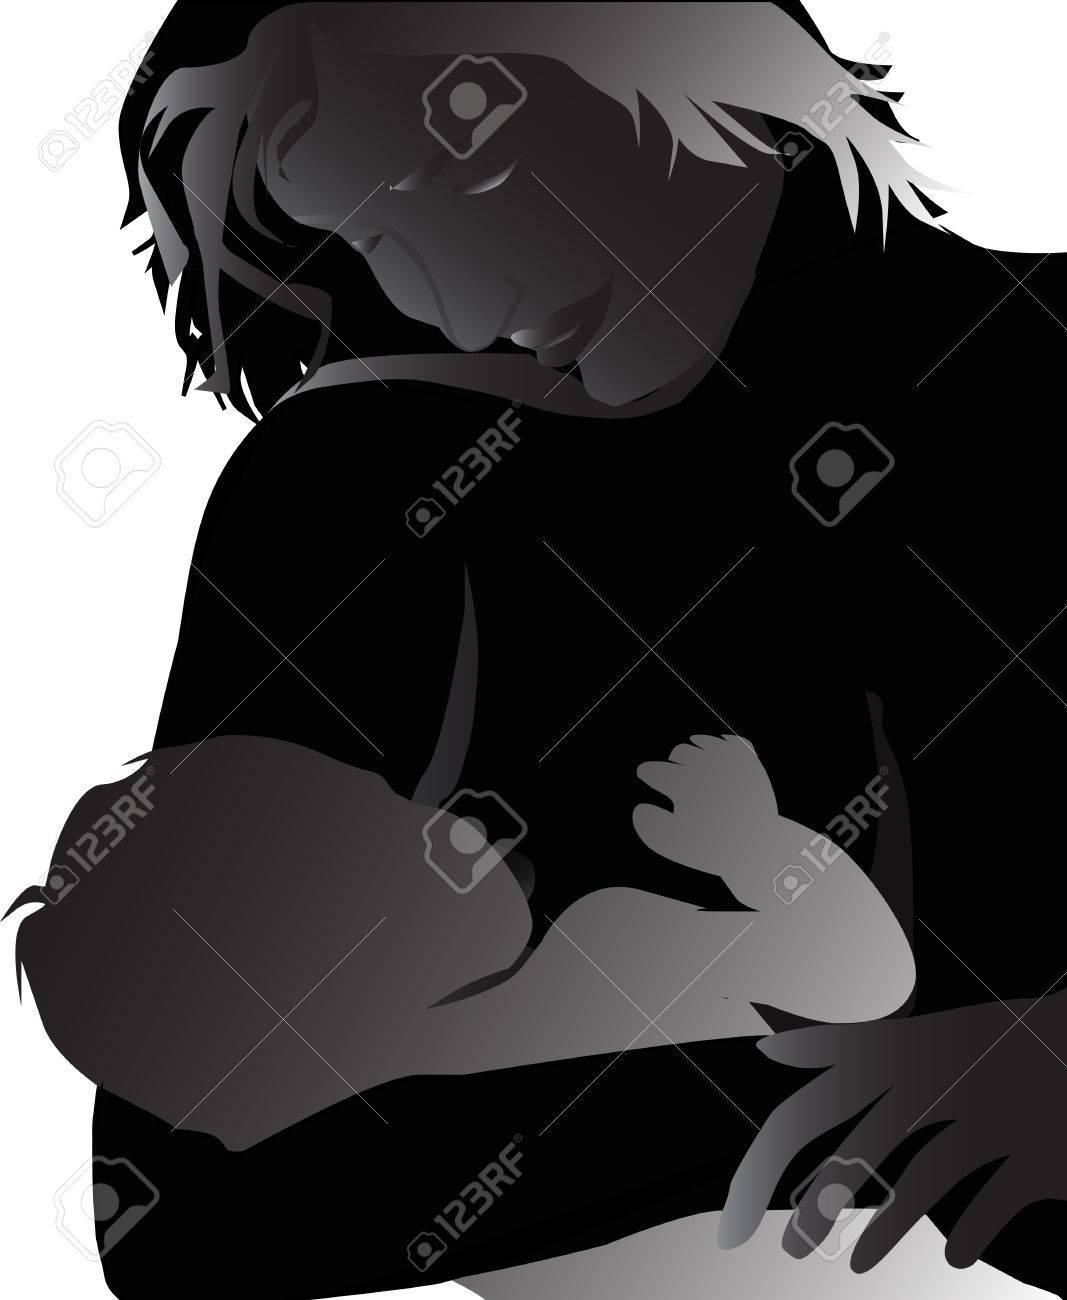 Breastfeeding - 18424295